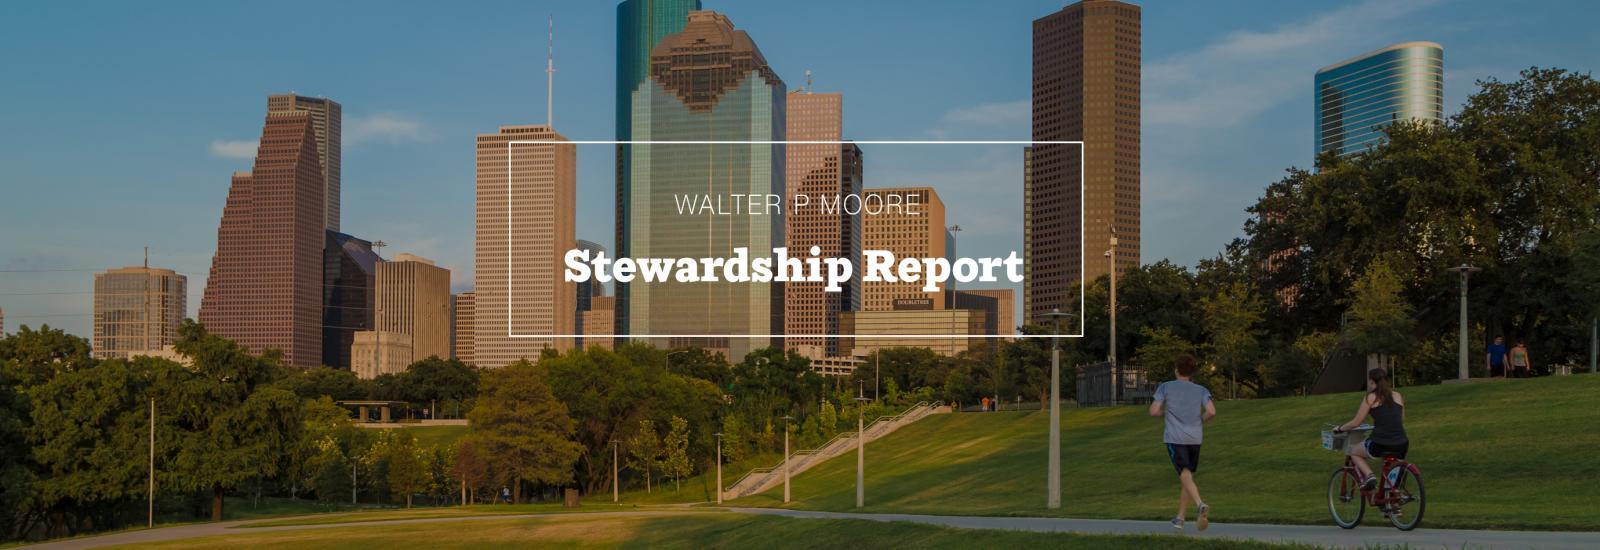 Stewardship Report Feature